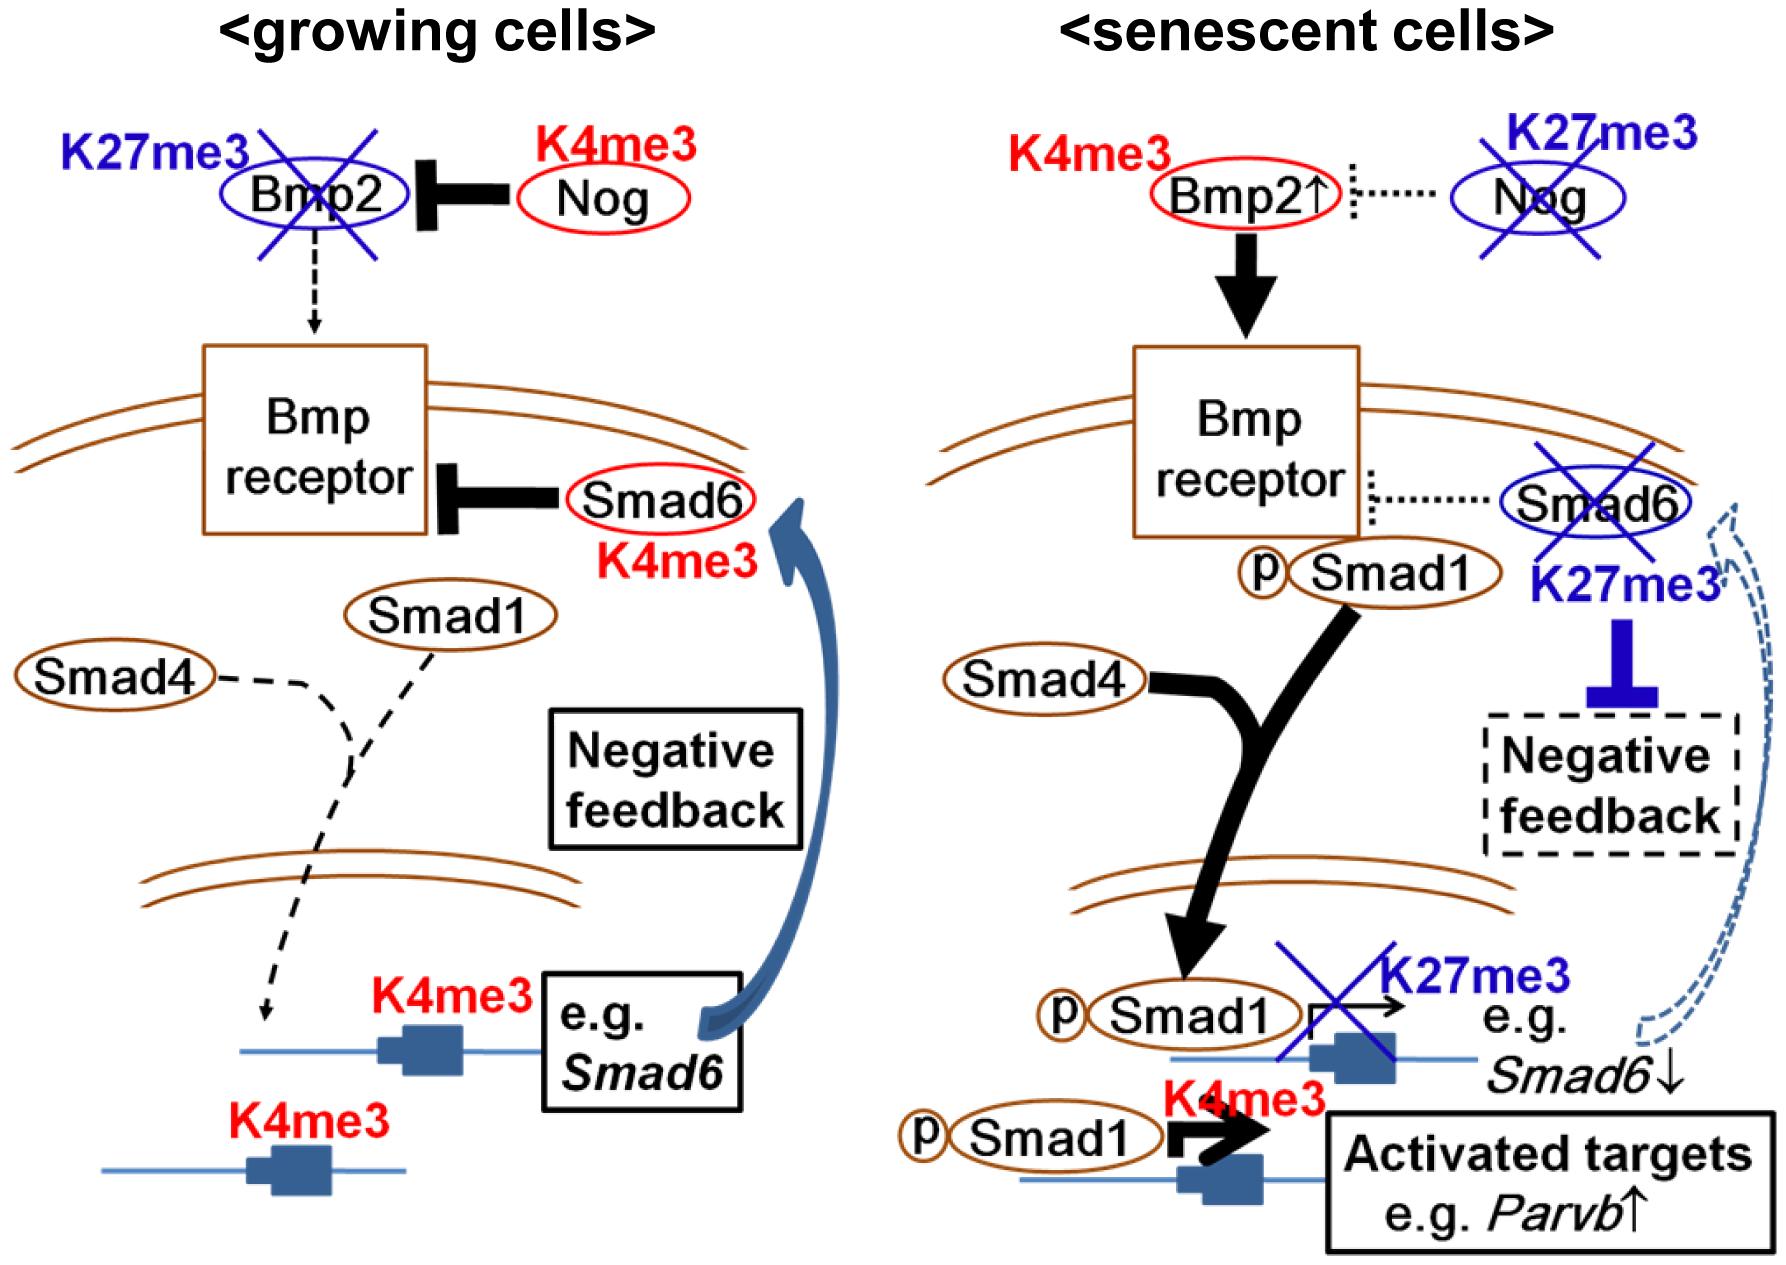 Schema of epigenetic regulation of Bmp2/Smad1 signal.